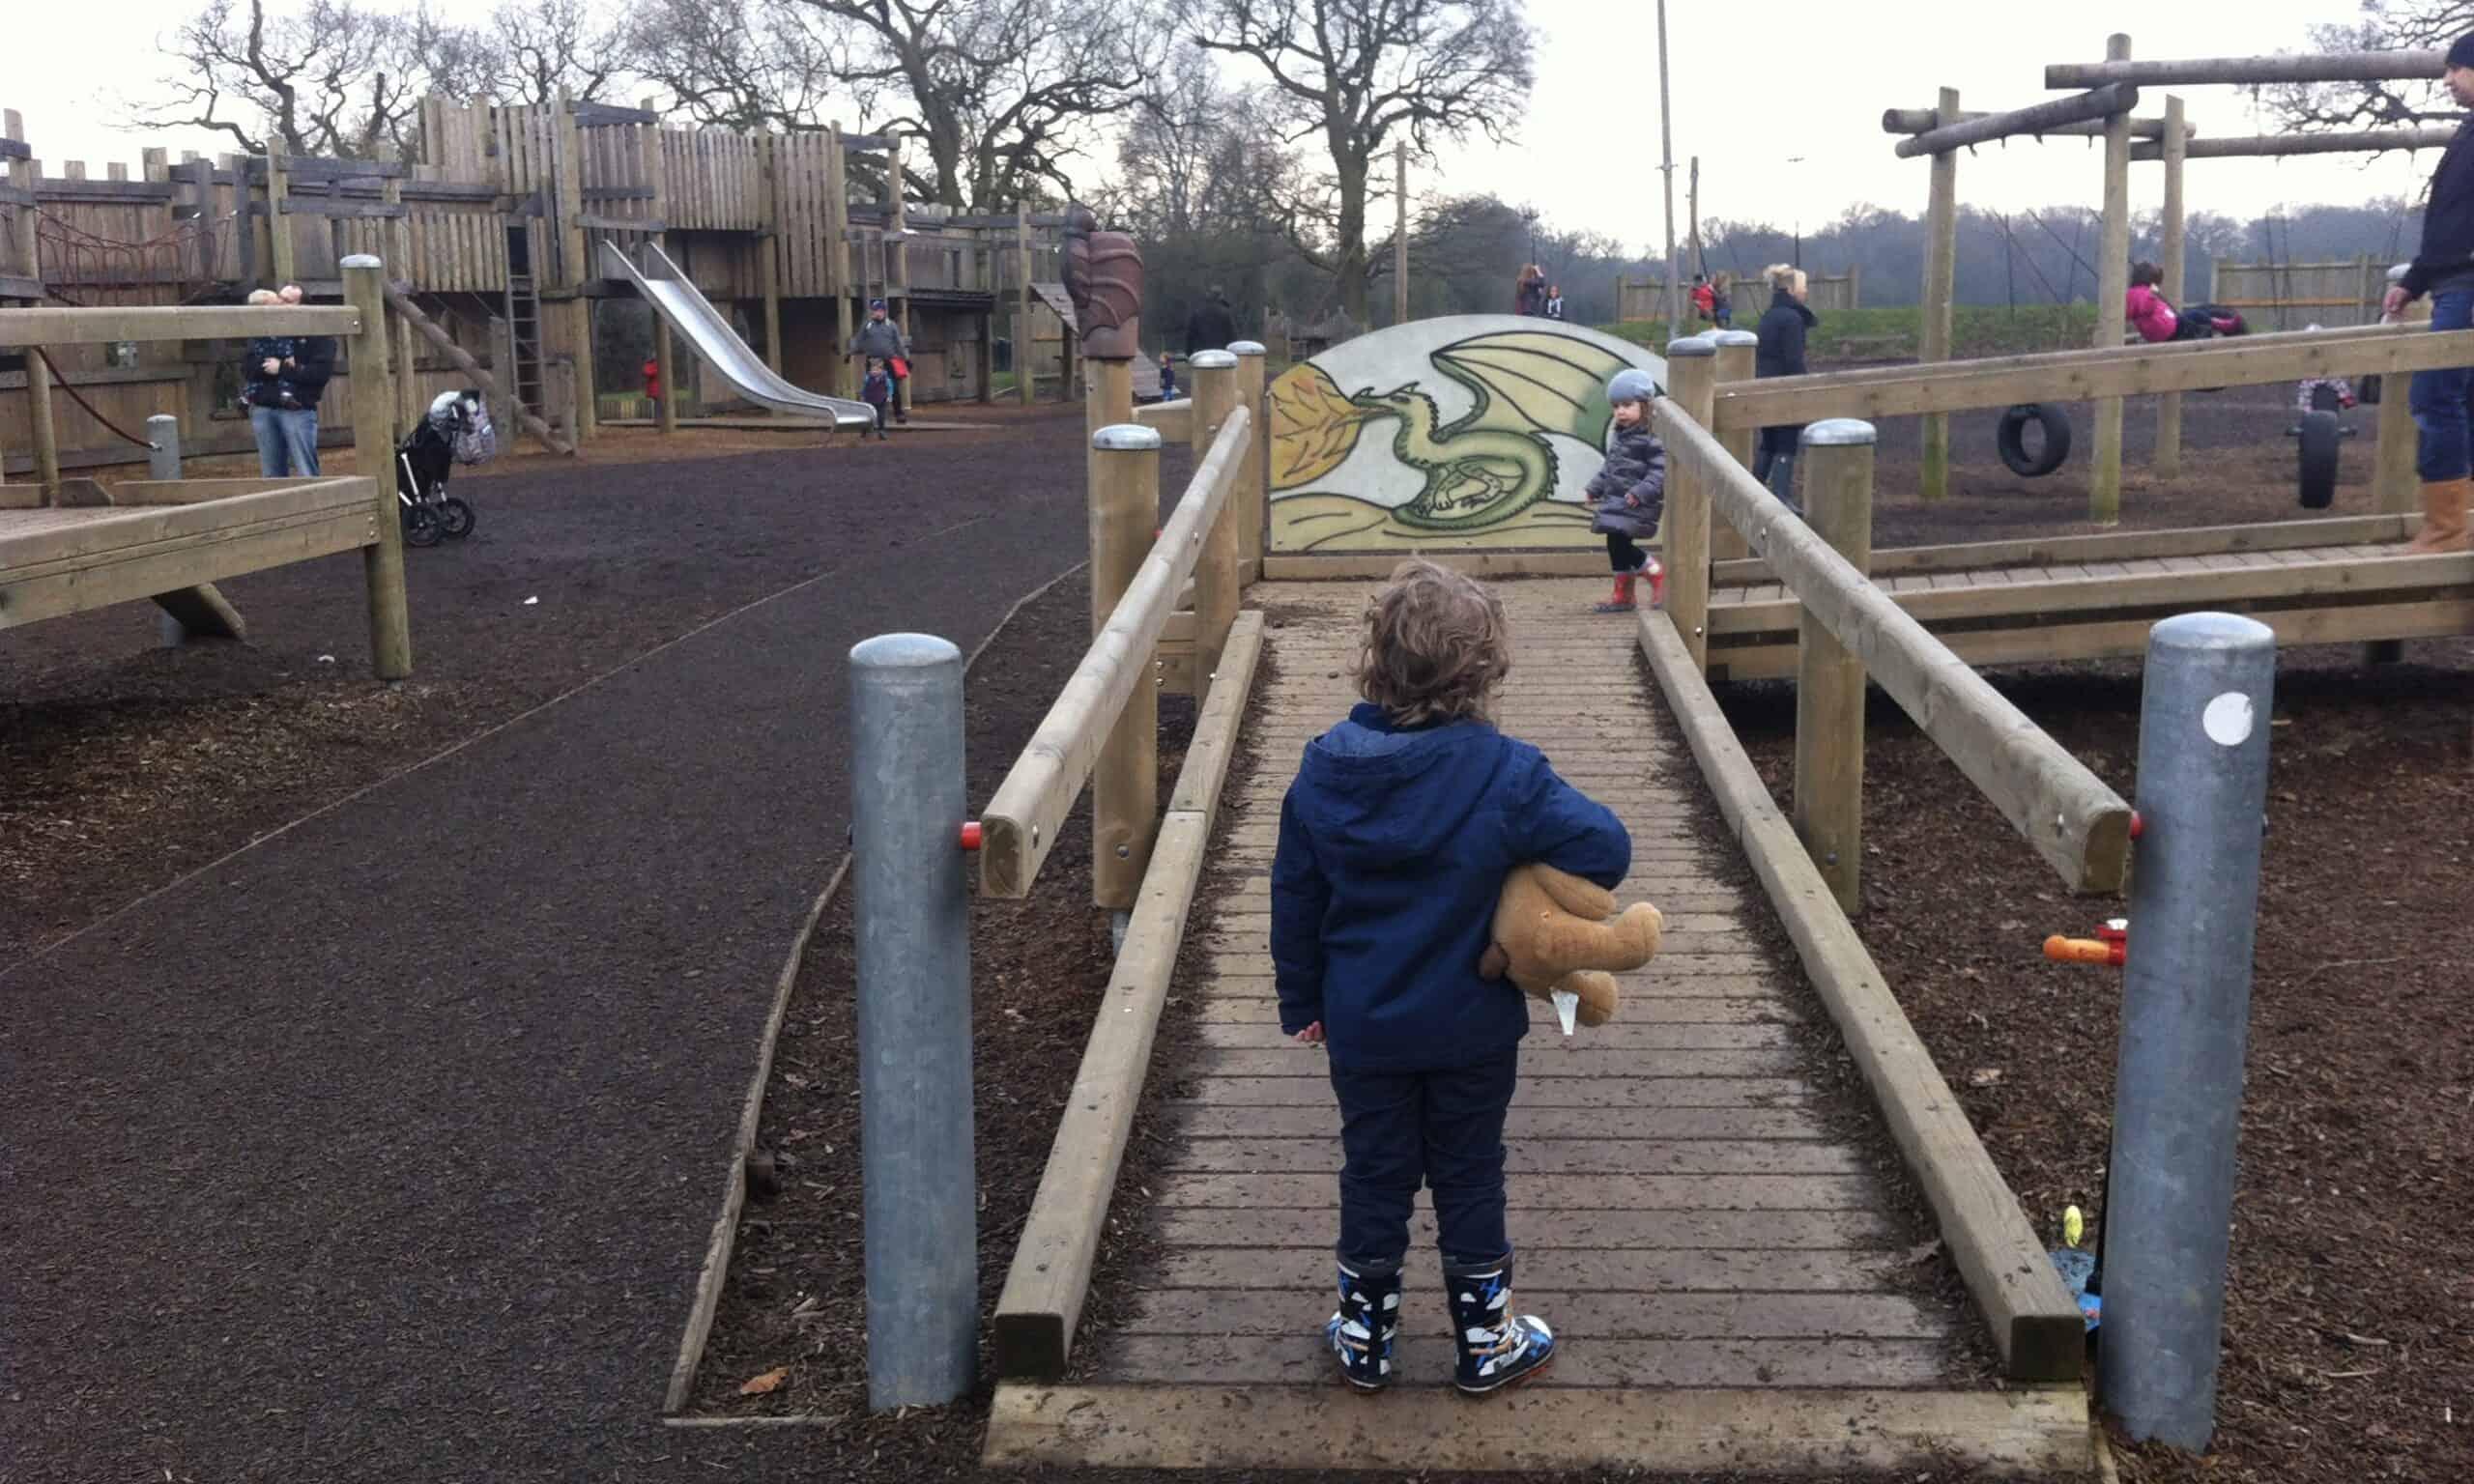 The adventure playground at Hylands Park Chelmsford